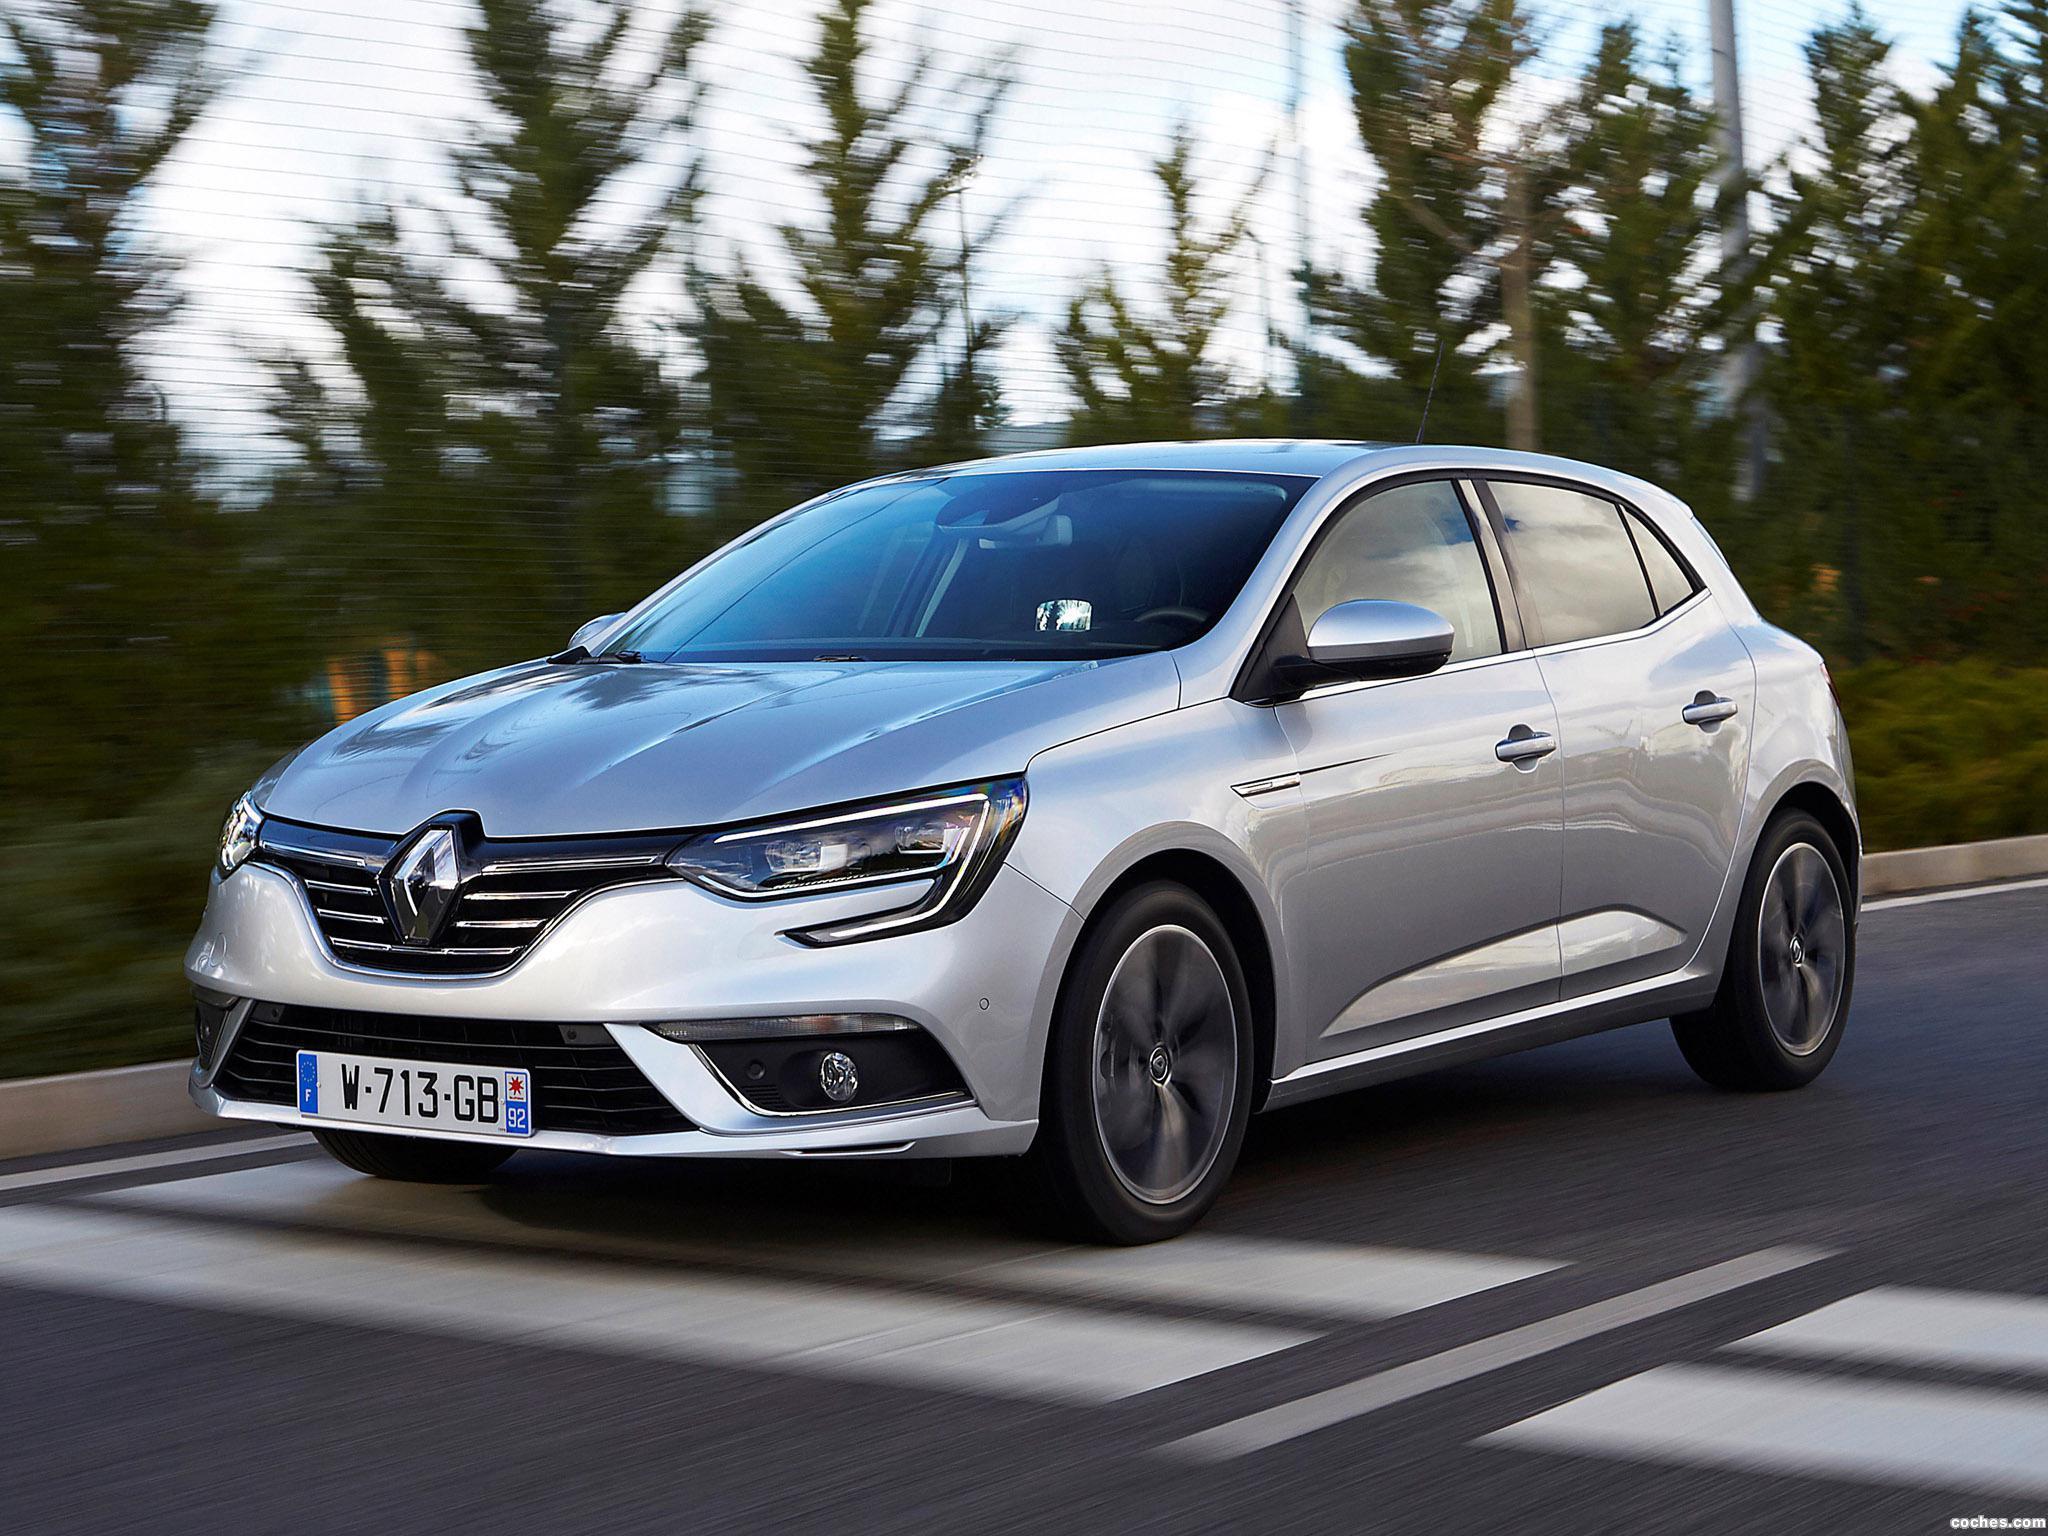 Foto 13 de Renault Megane 2016